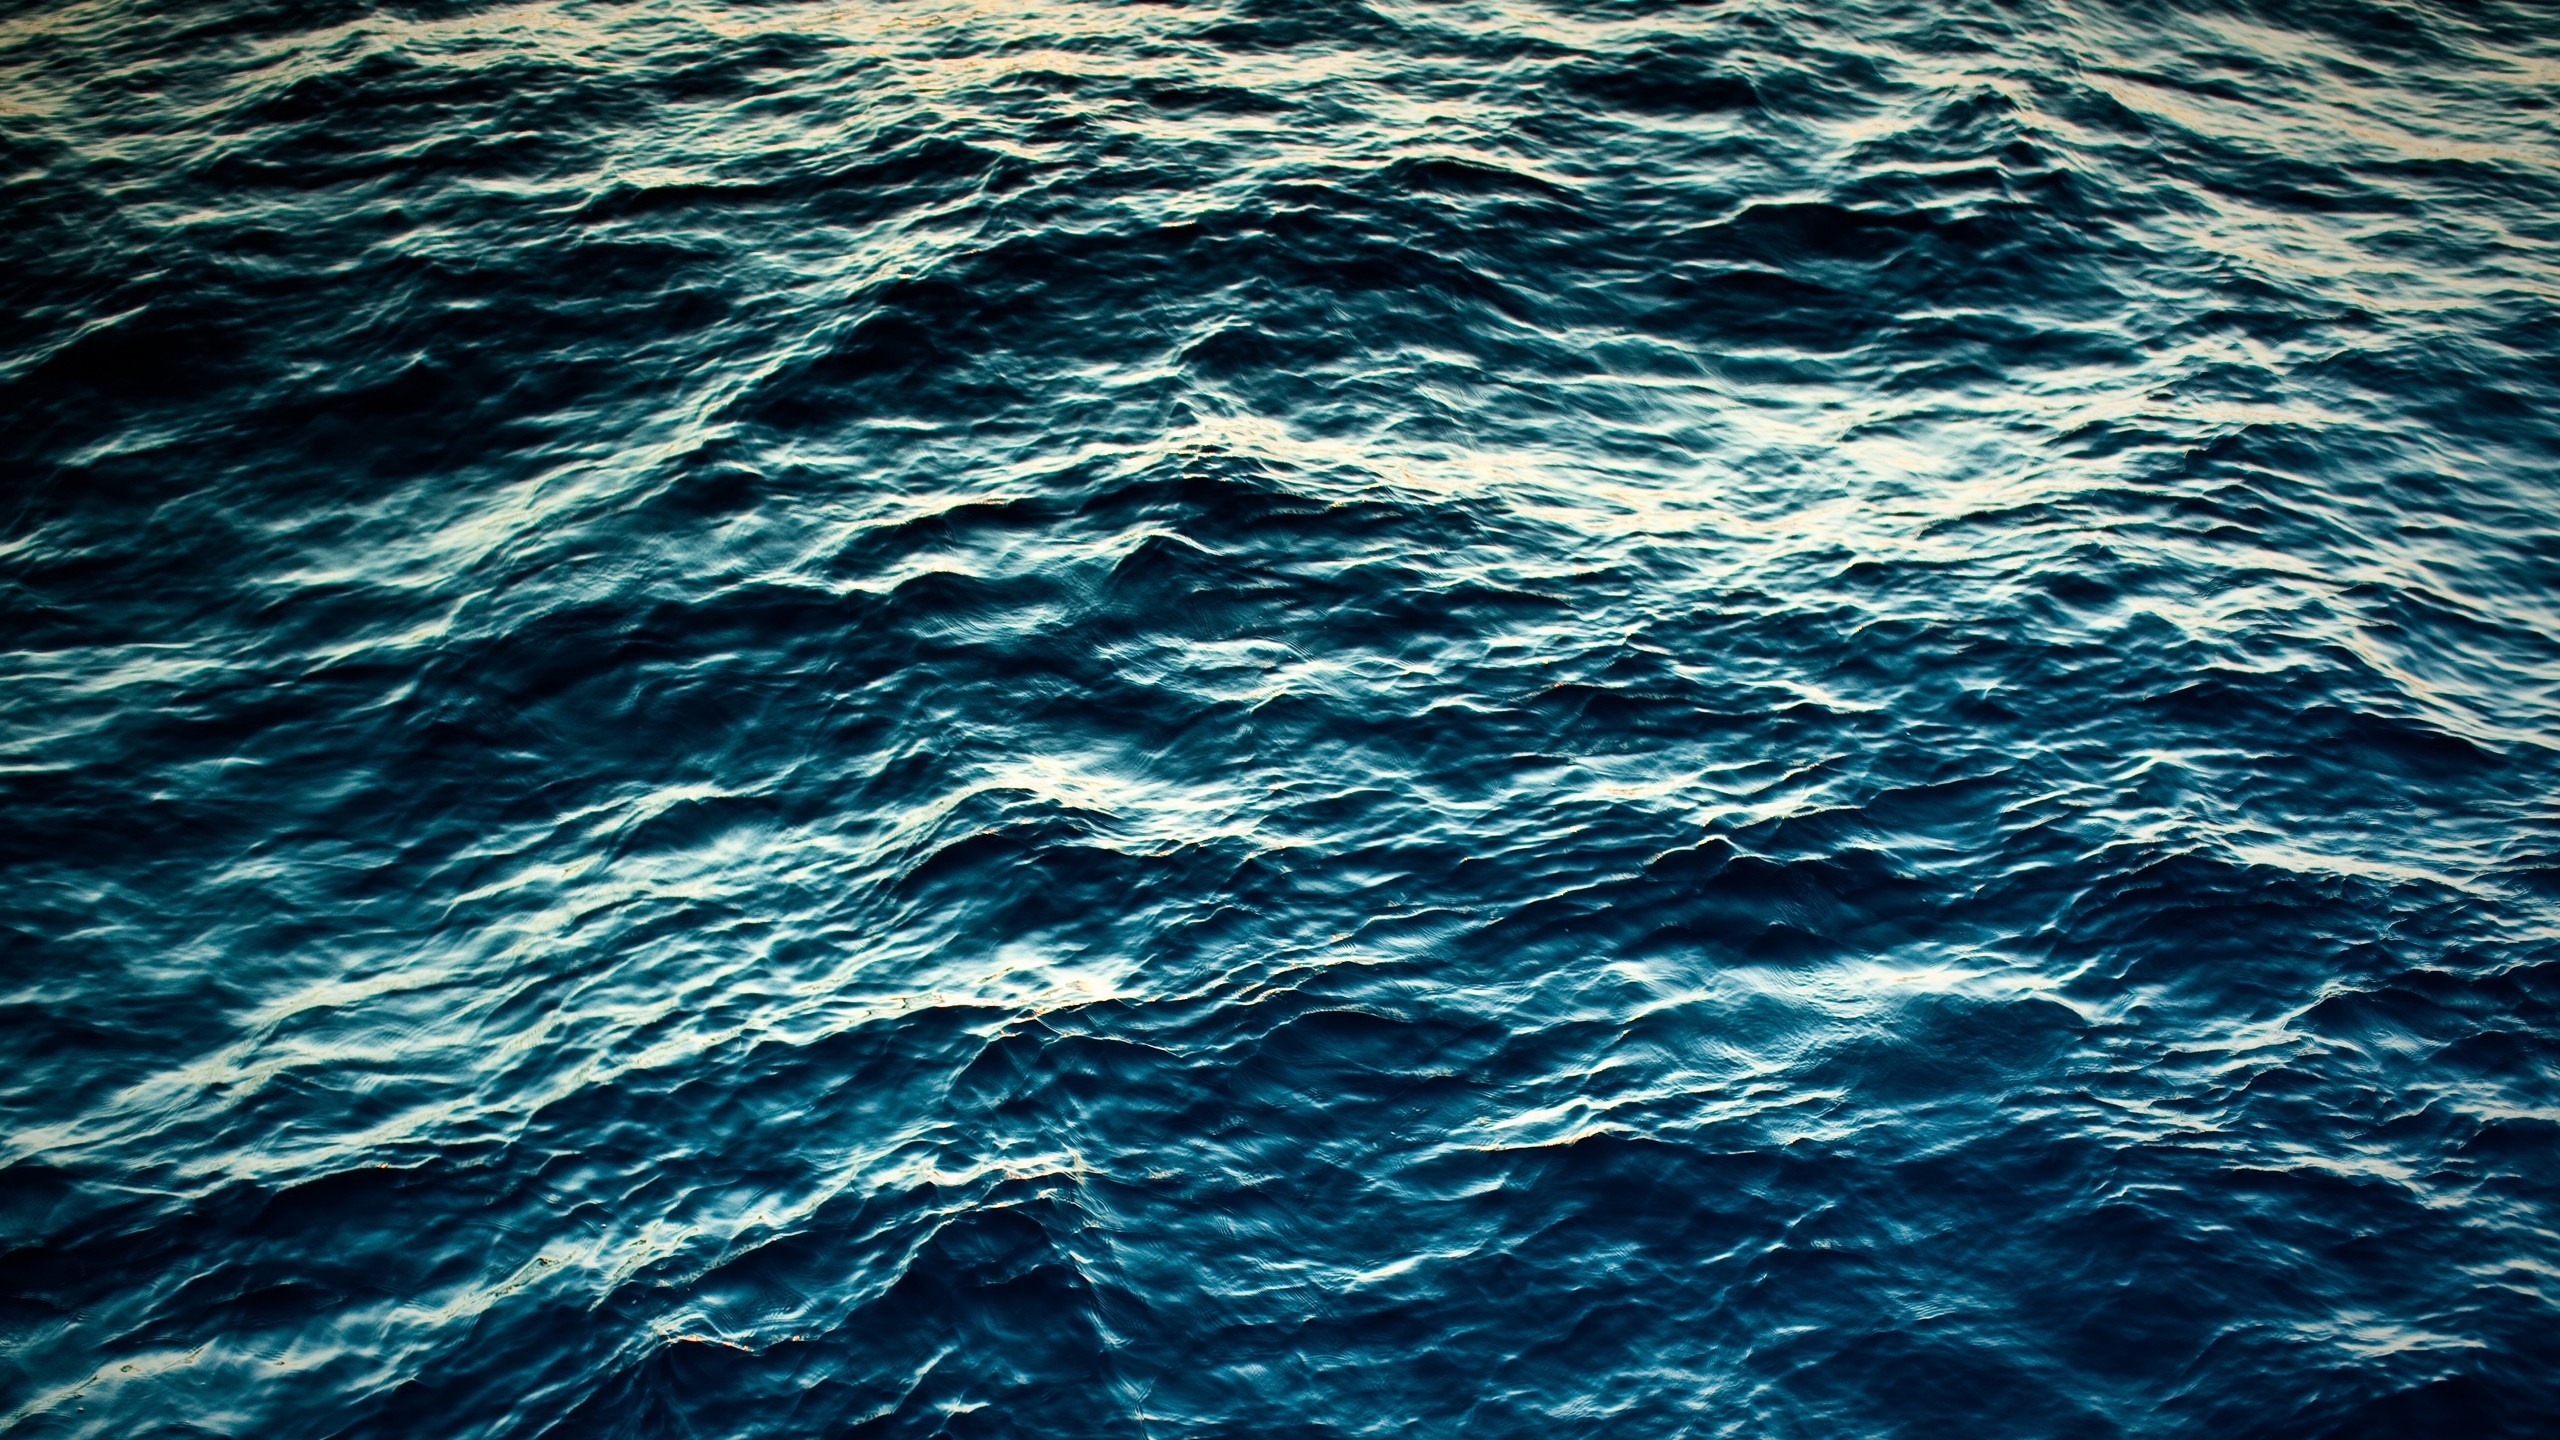 Download Wallpaper High Resolution Ocean - 837149-beautiful-ocean-wallpaper-2560x1440-for-xiaomi  Image_488160.jpg